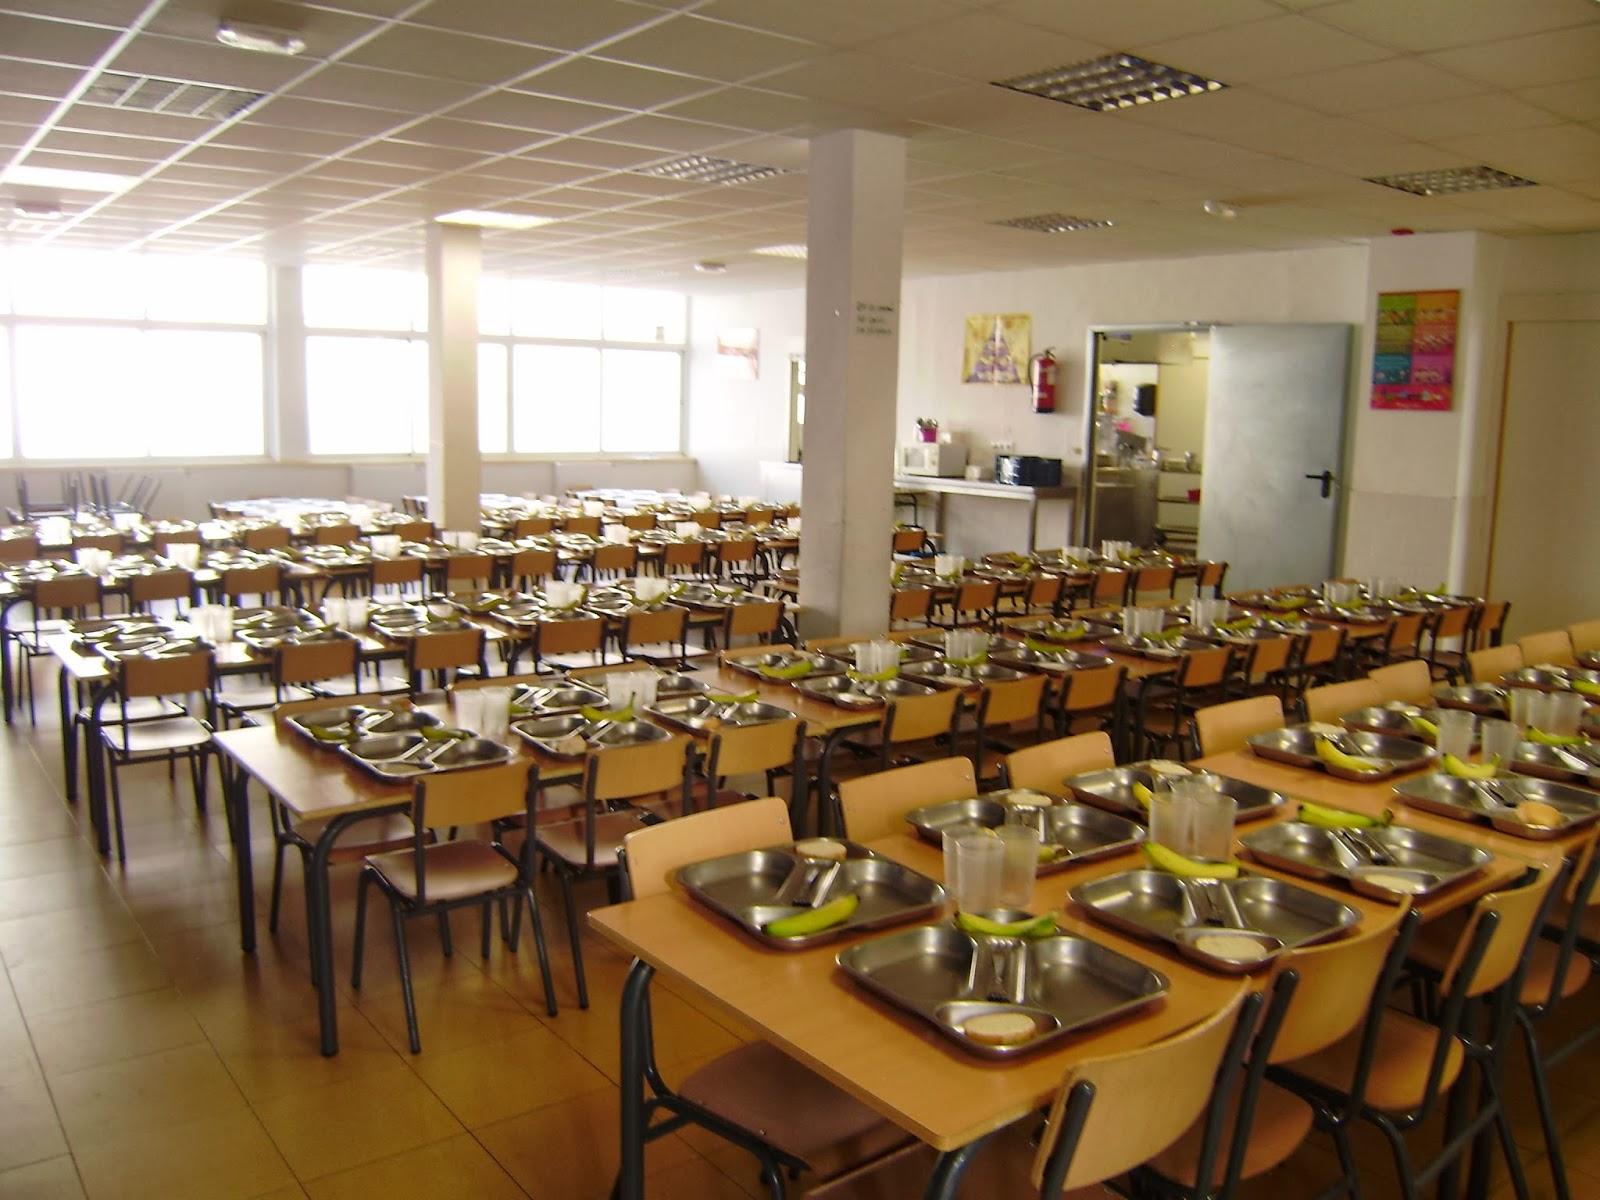 Real armada comedor escolar for Mesas comedor escolar